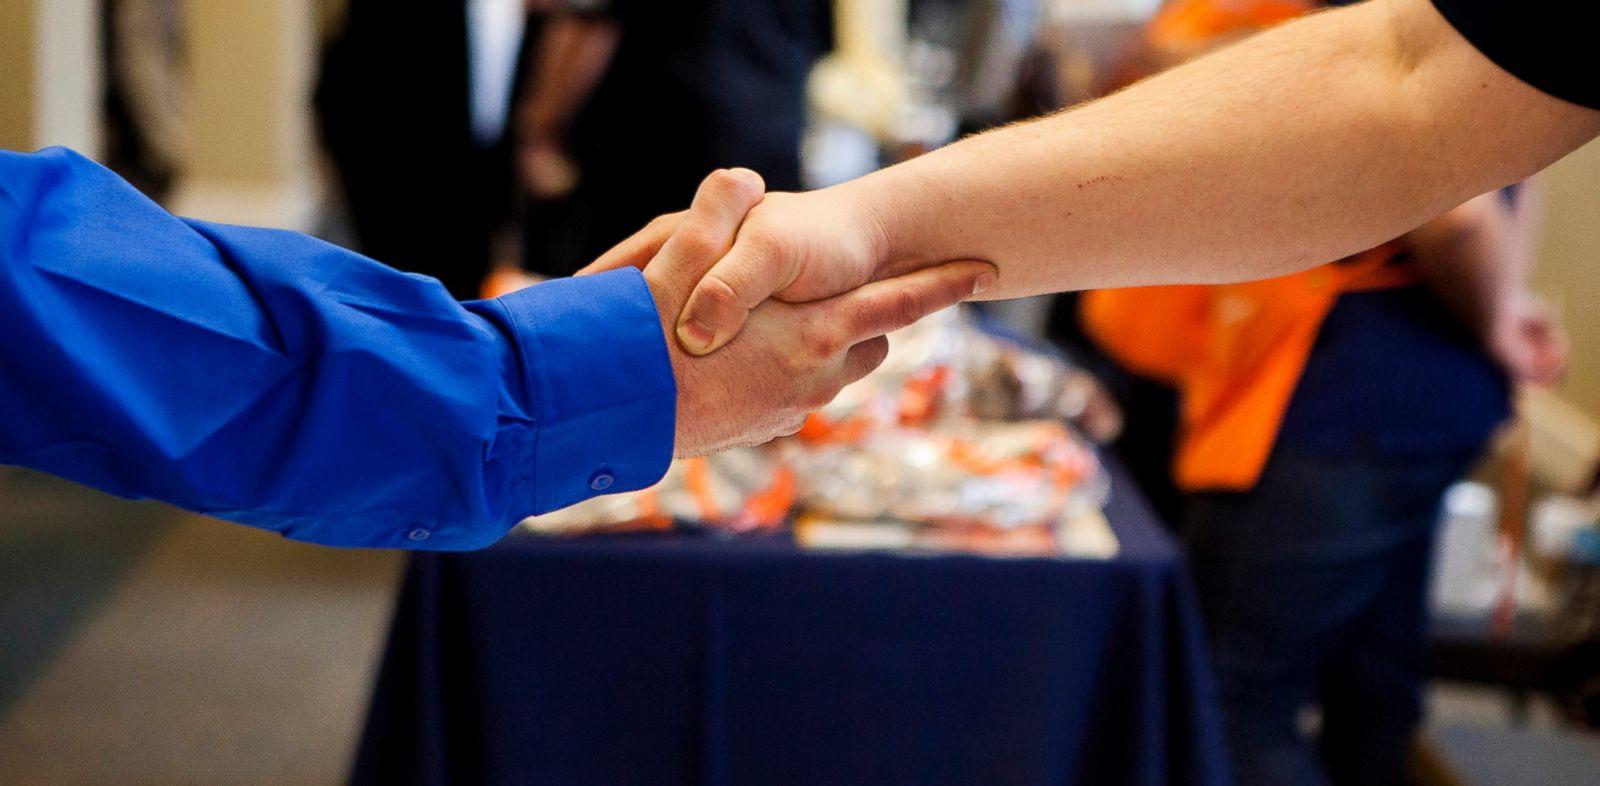 PHOTO: A job seeker shakes hands with a representative at the Recruit Military veteran job fair in San Diego, Feb. 27, 2014.